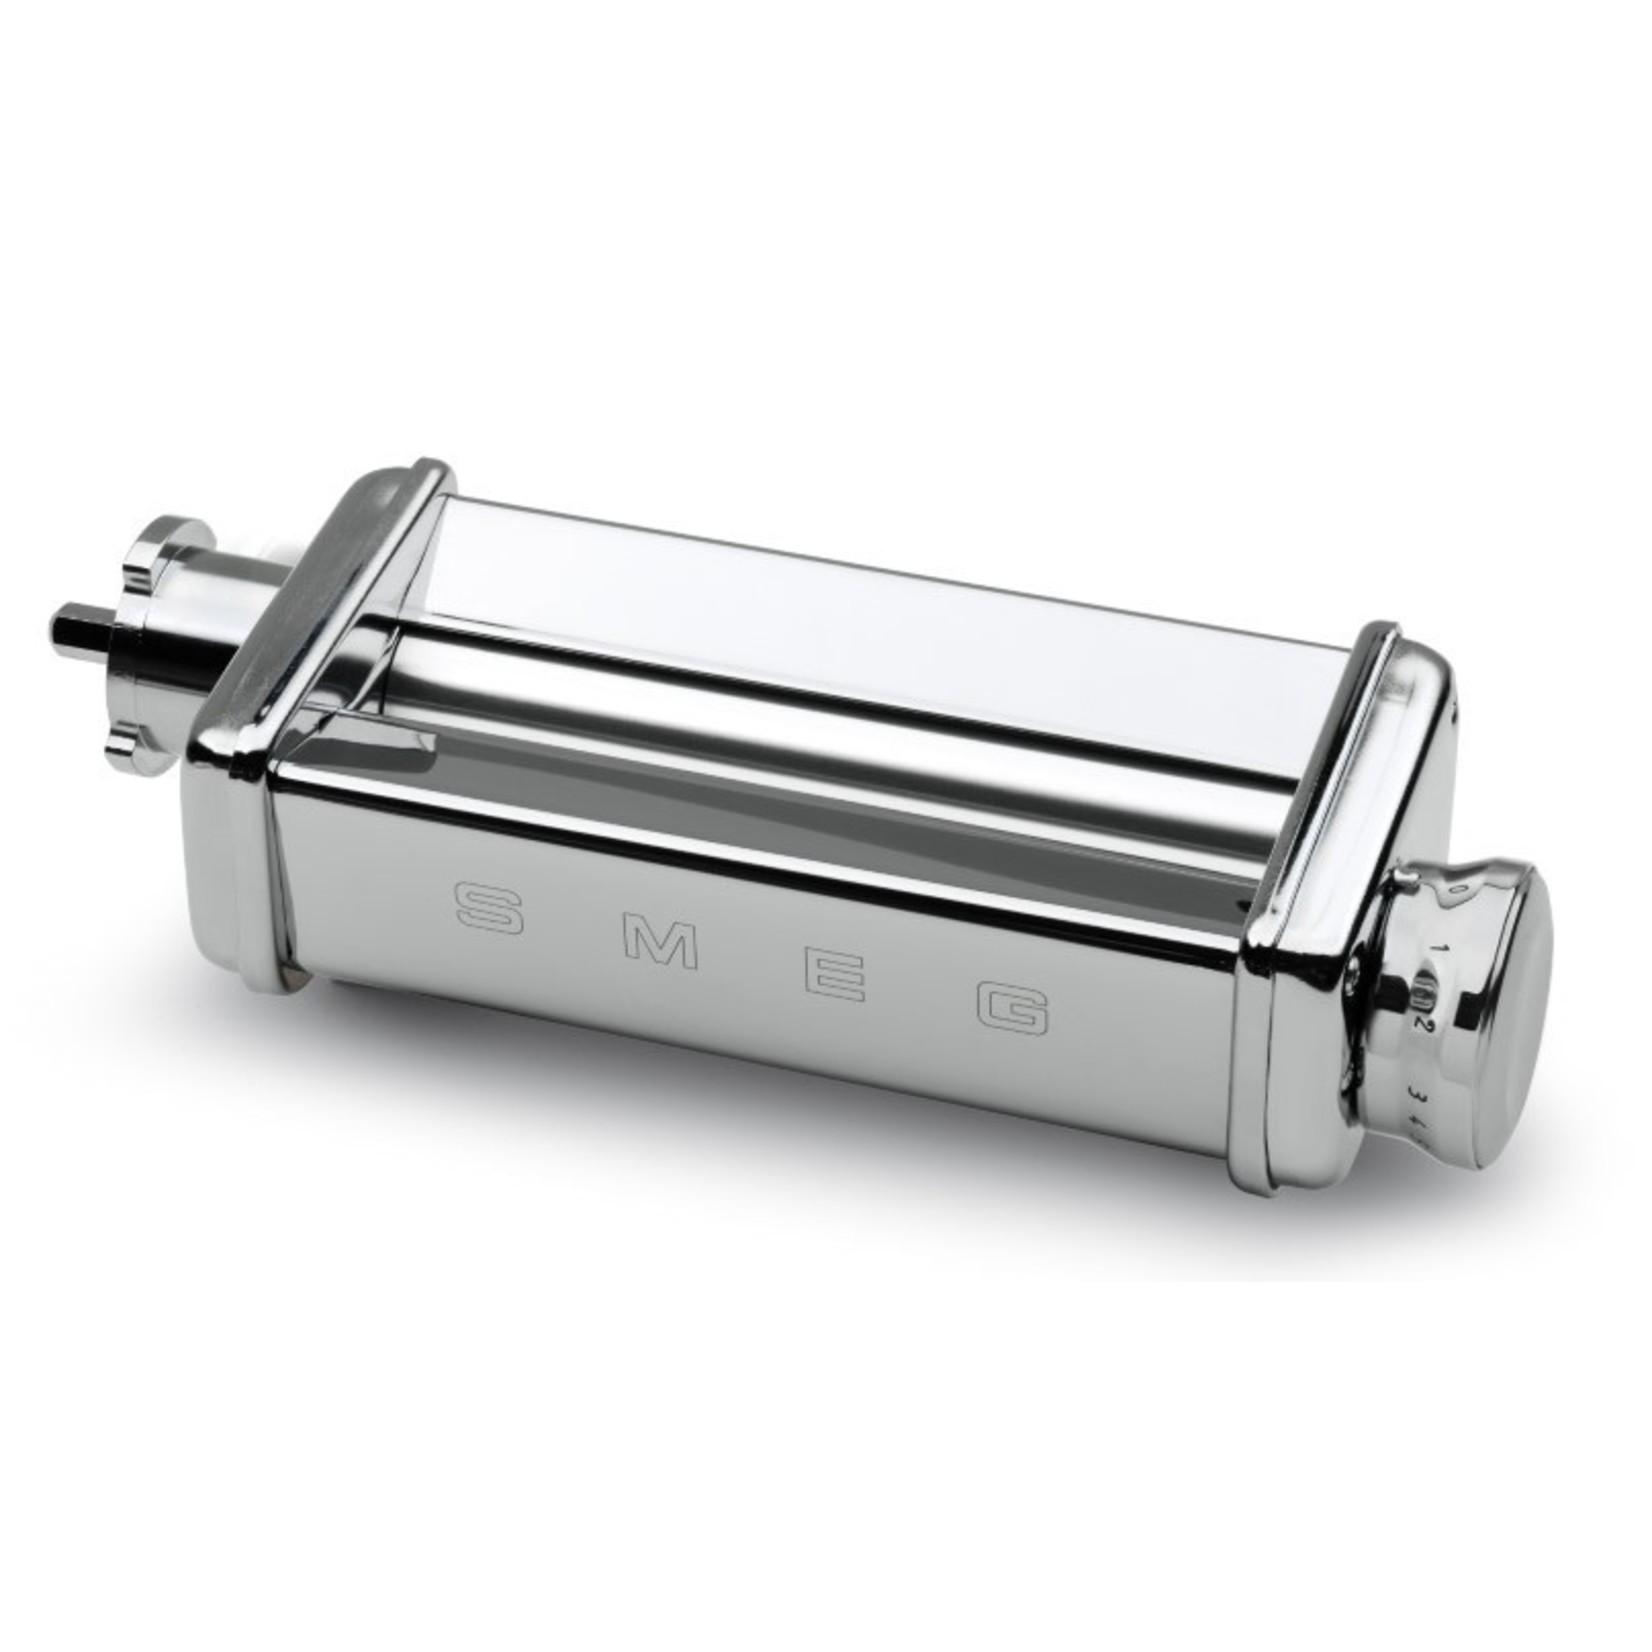 Smeg Smeg pastaroller voor SMF01